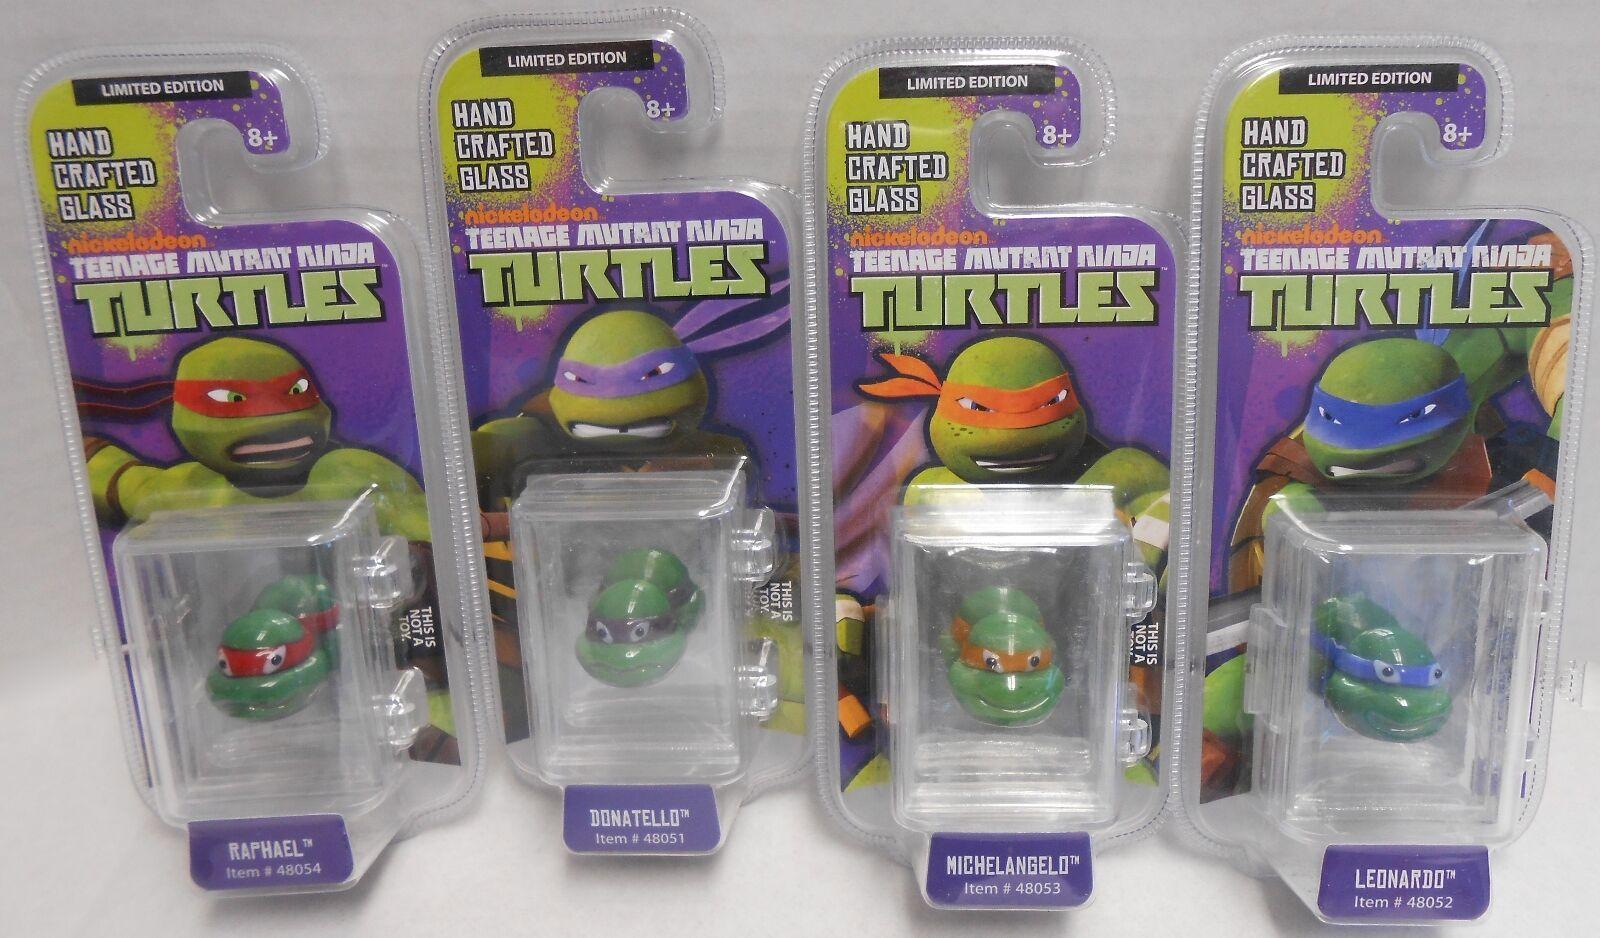 Mutant Ninja Turtles Limited Edition Hand Crafted Glass figurines 4 set, Mint